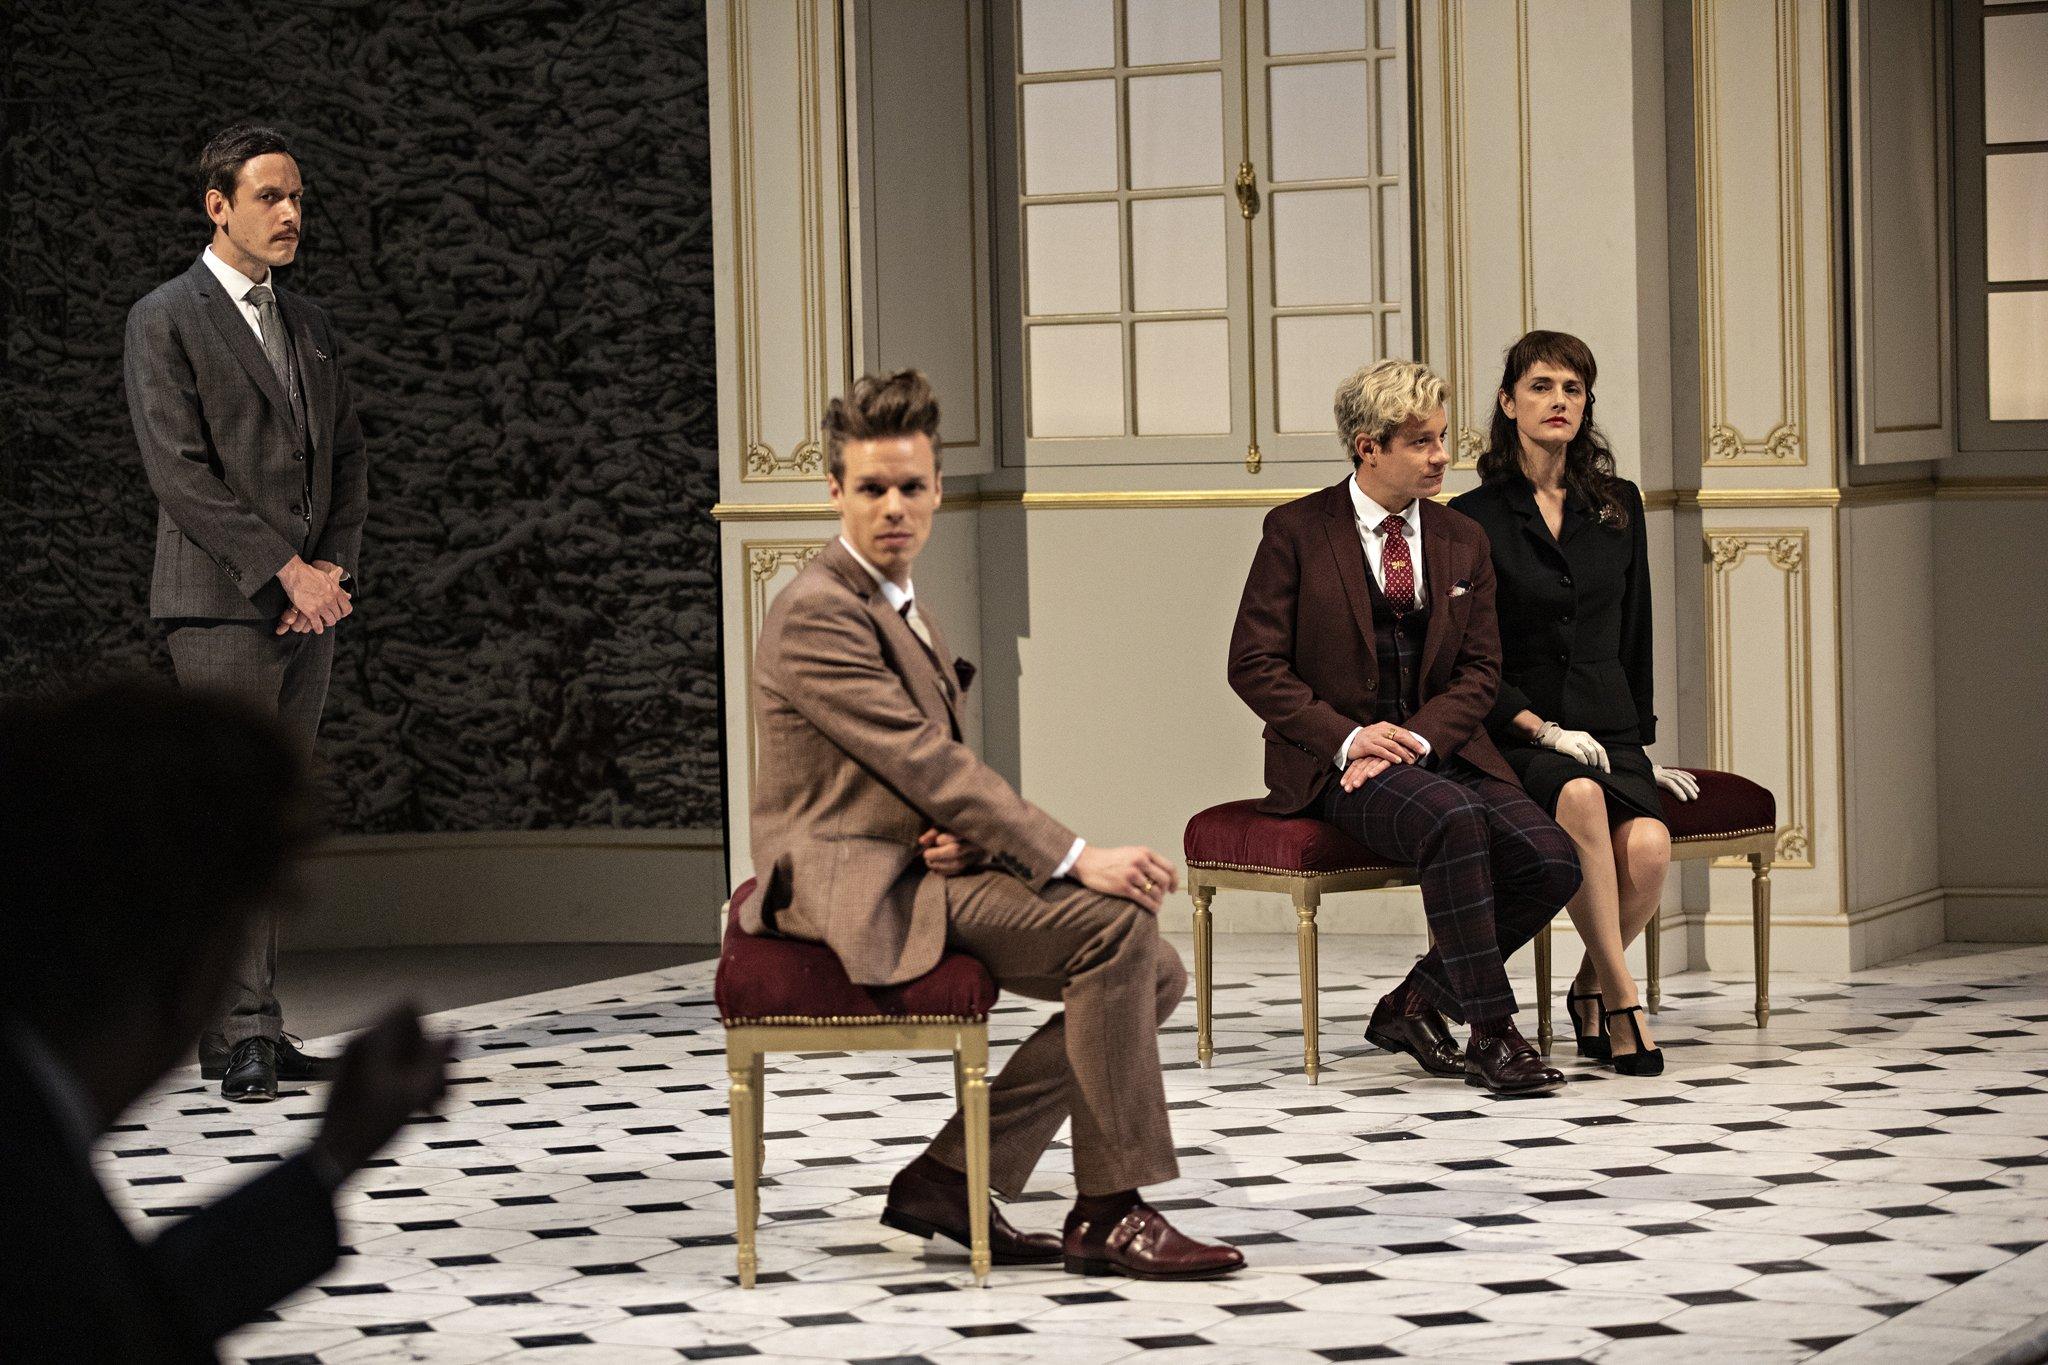 _Theatre_le misanthrope_TNS Strasbourg_c_jean louis fernandez_szenik